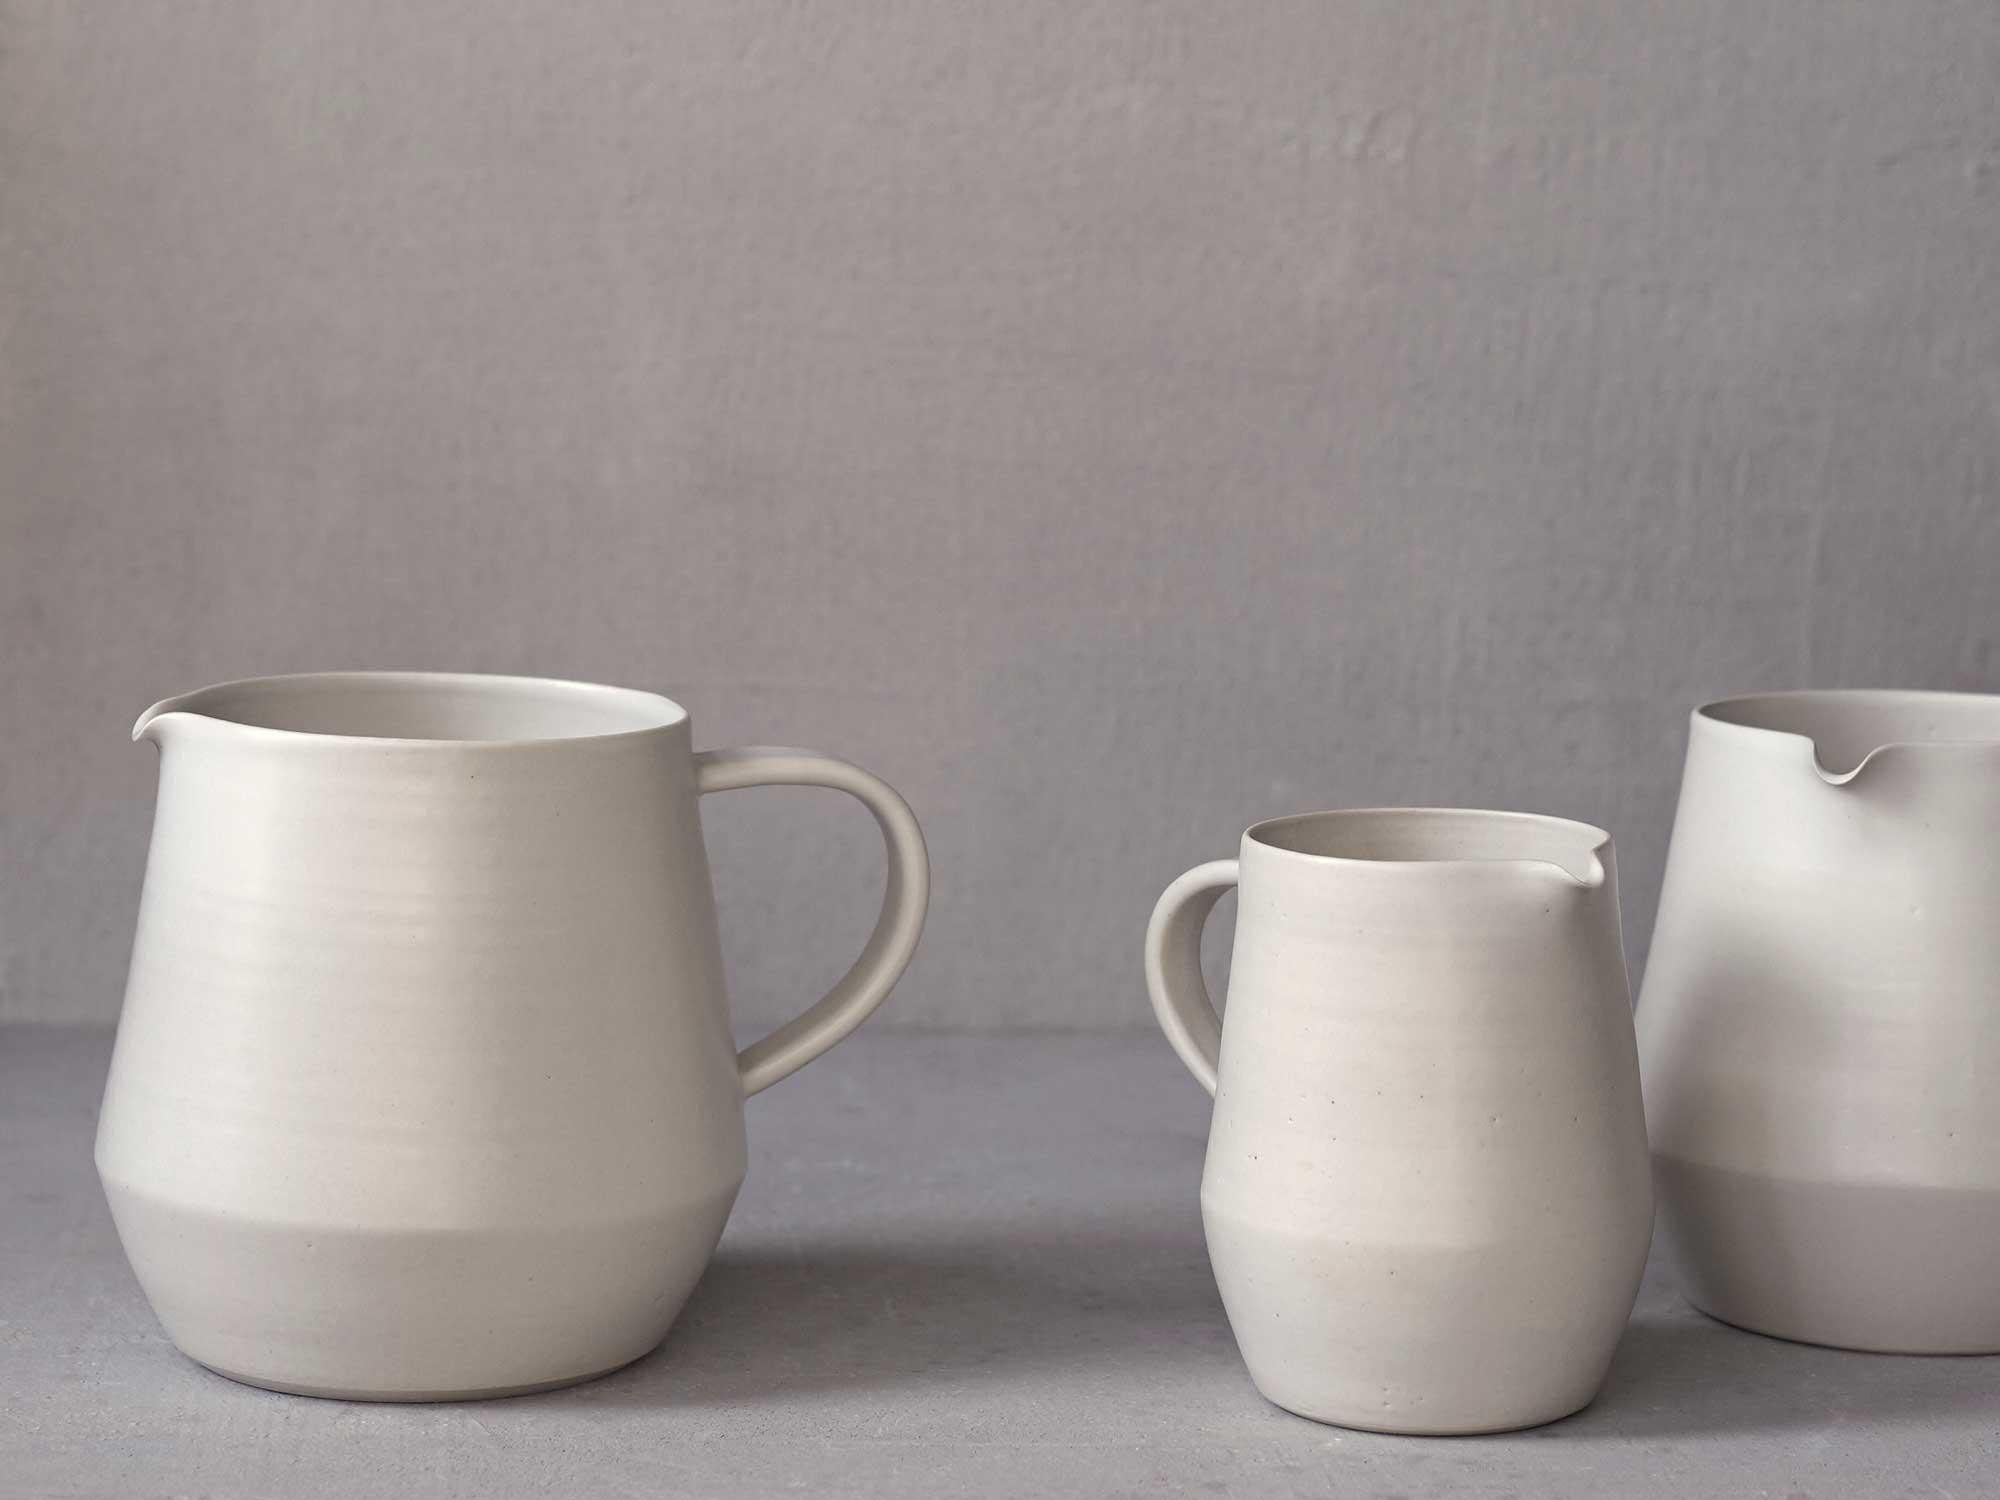 SAVEUR Gift Guides: Gorgeous Kitchen Ceramics We Love